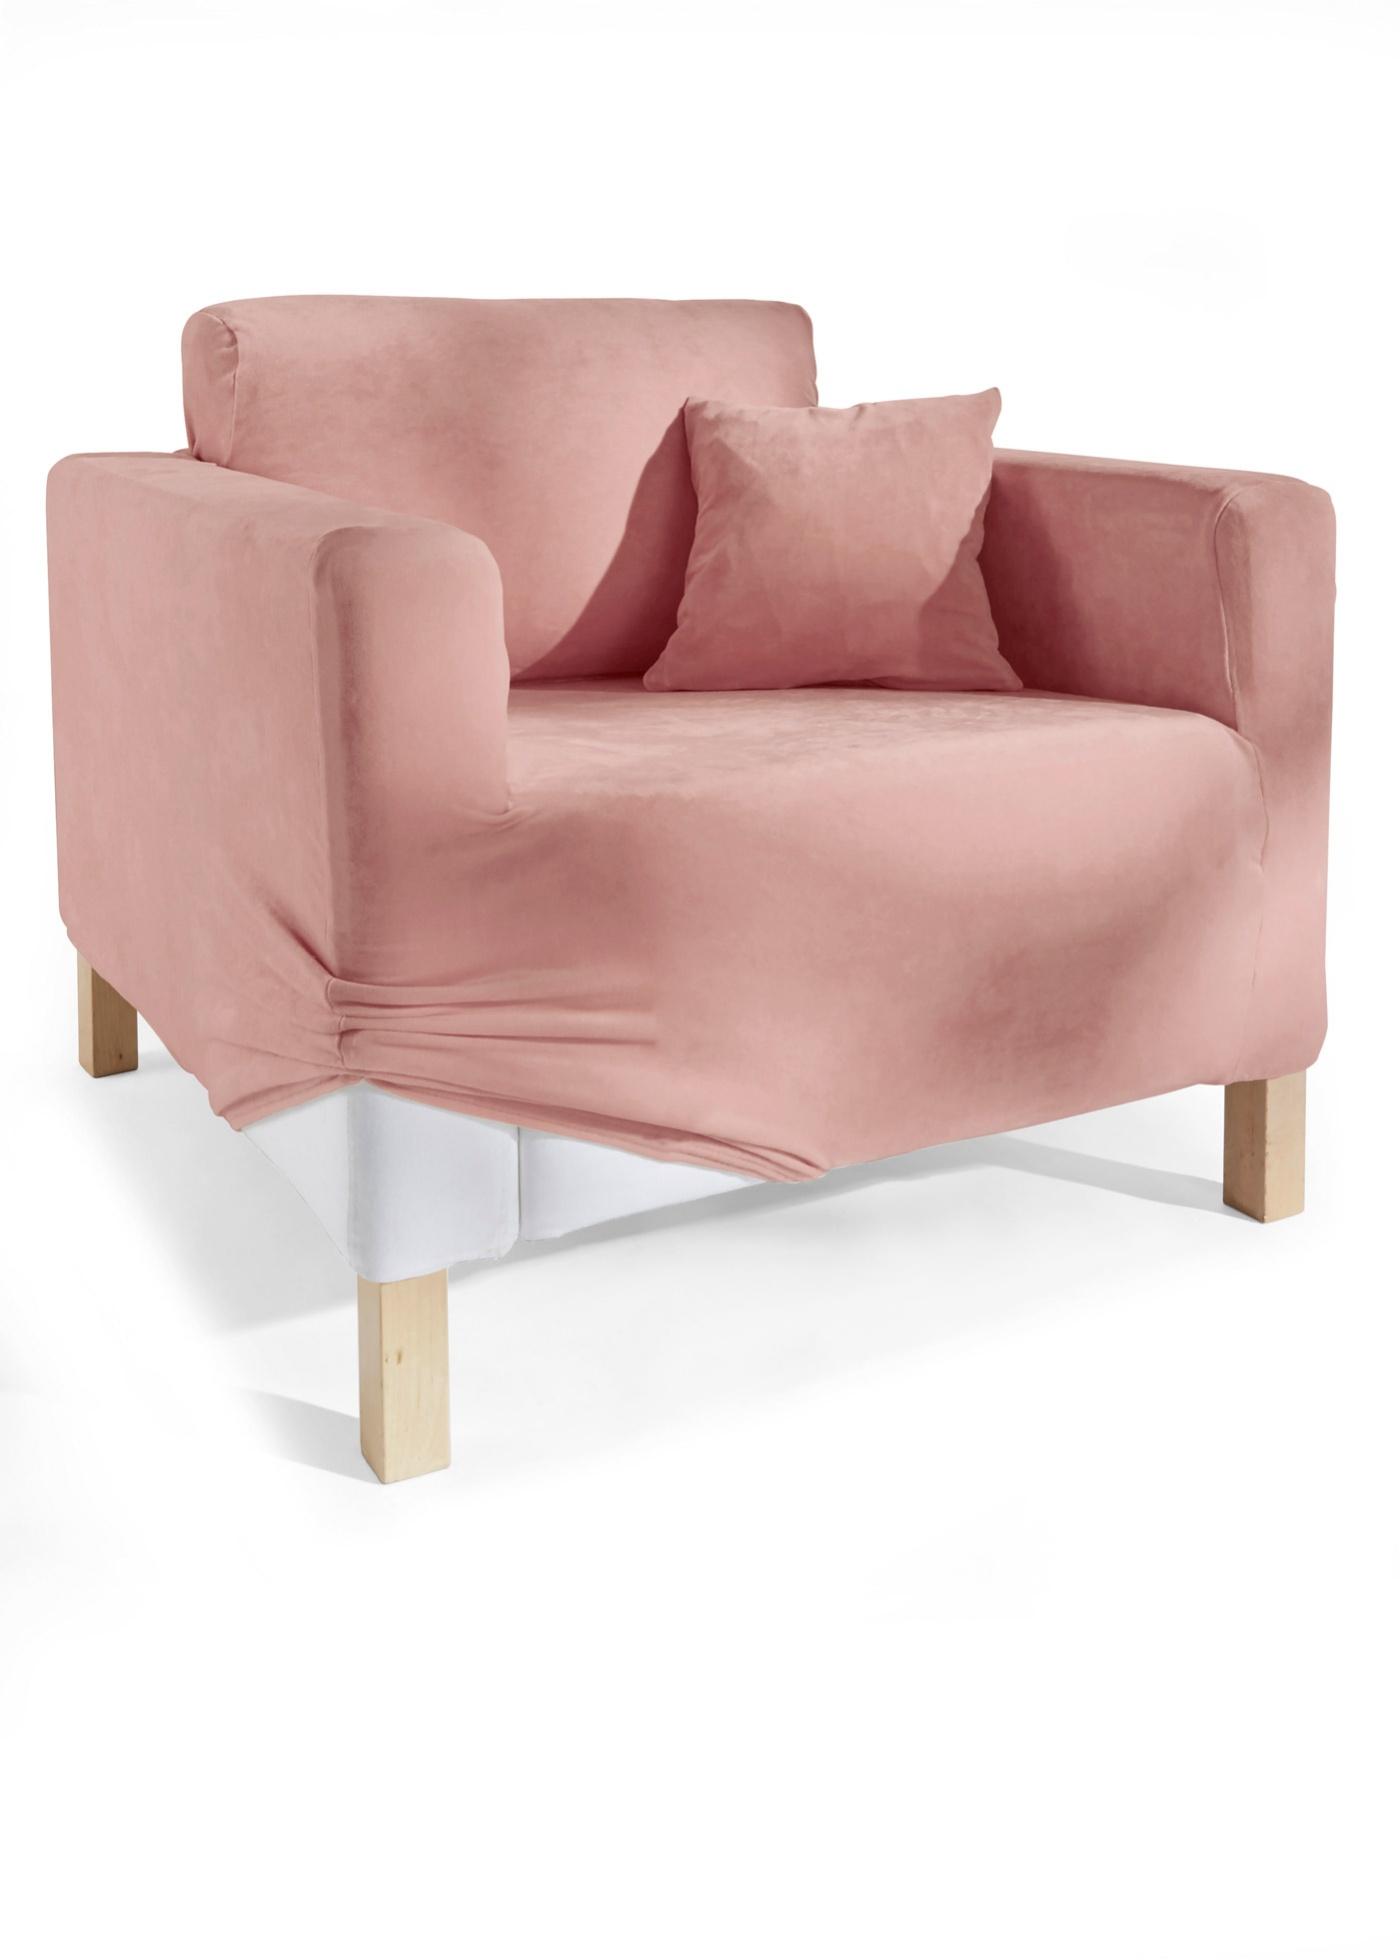 Copridivano Tina (rosa) - bpc living bonprix collection